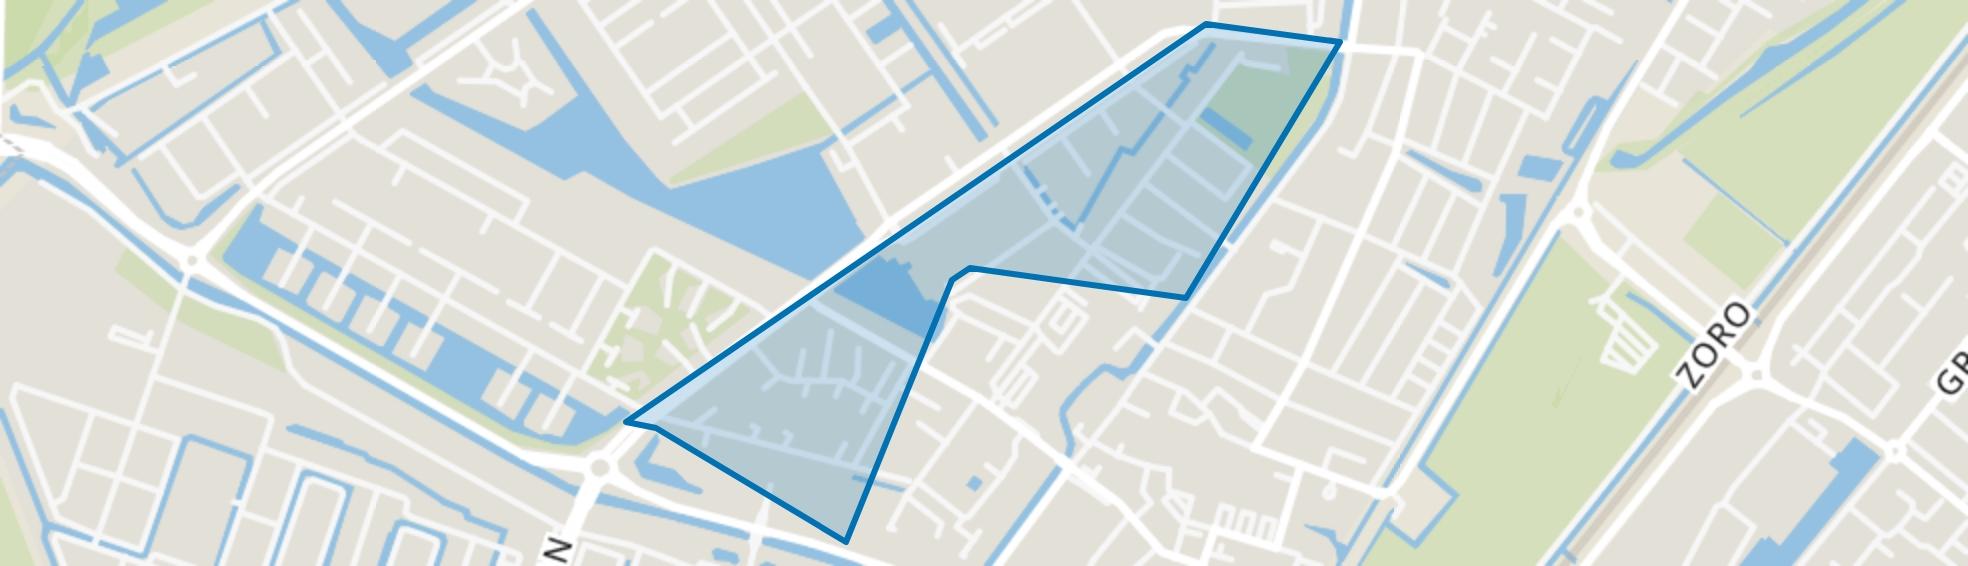 Parkbuurt, Berkel en Rodenrijs map